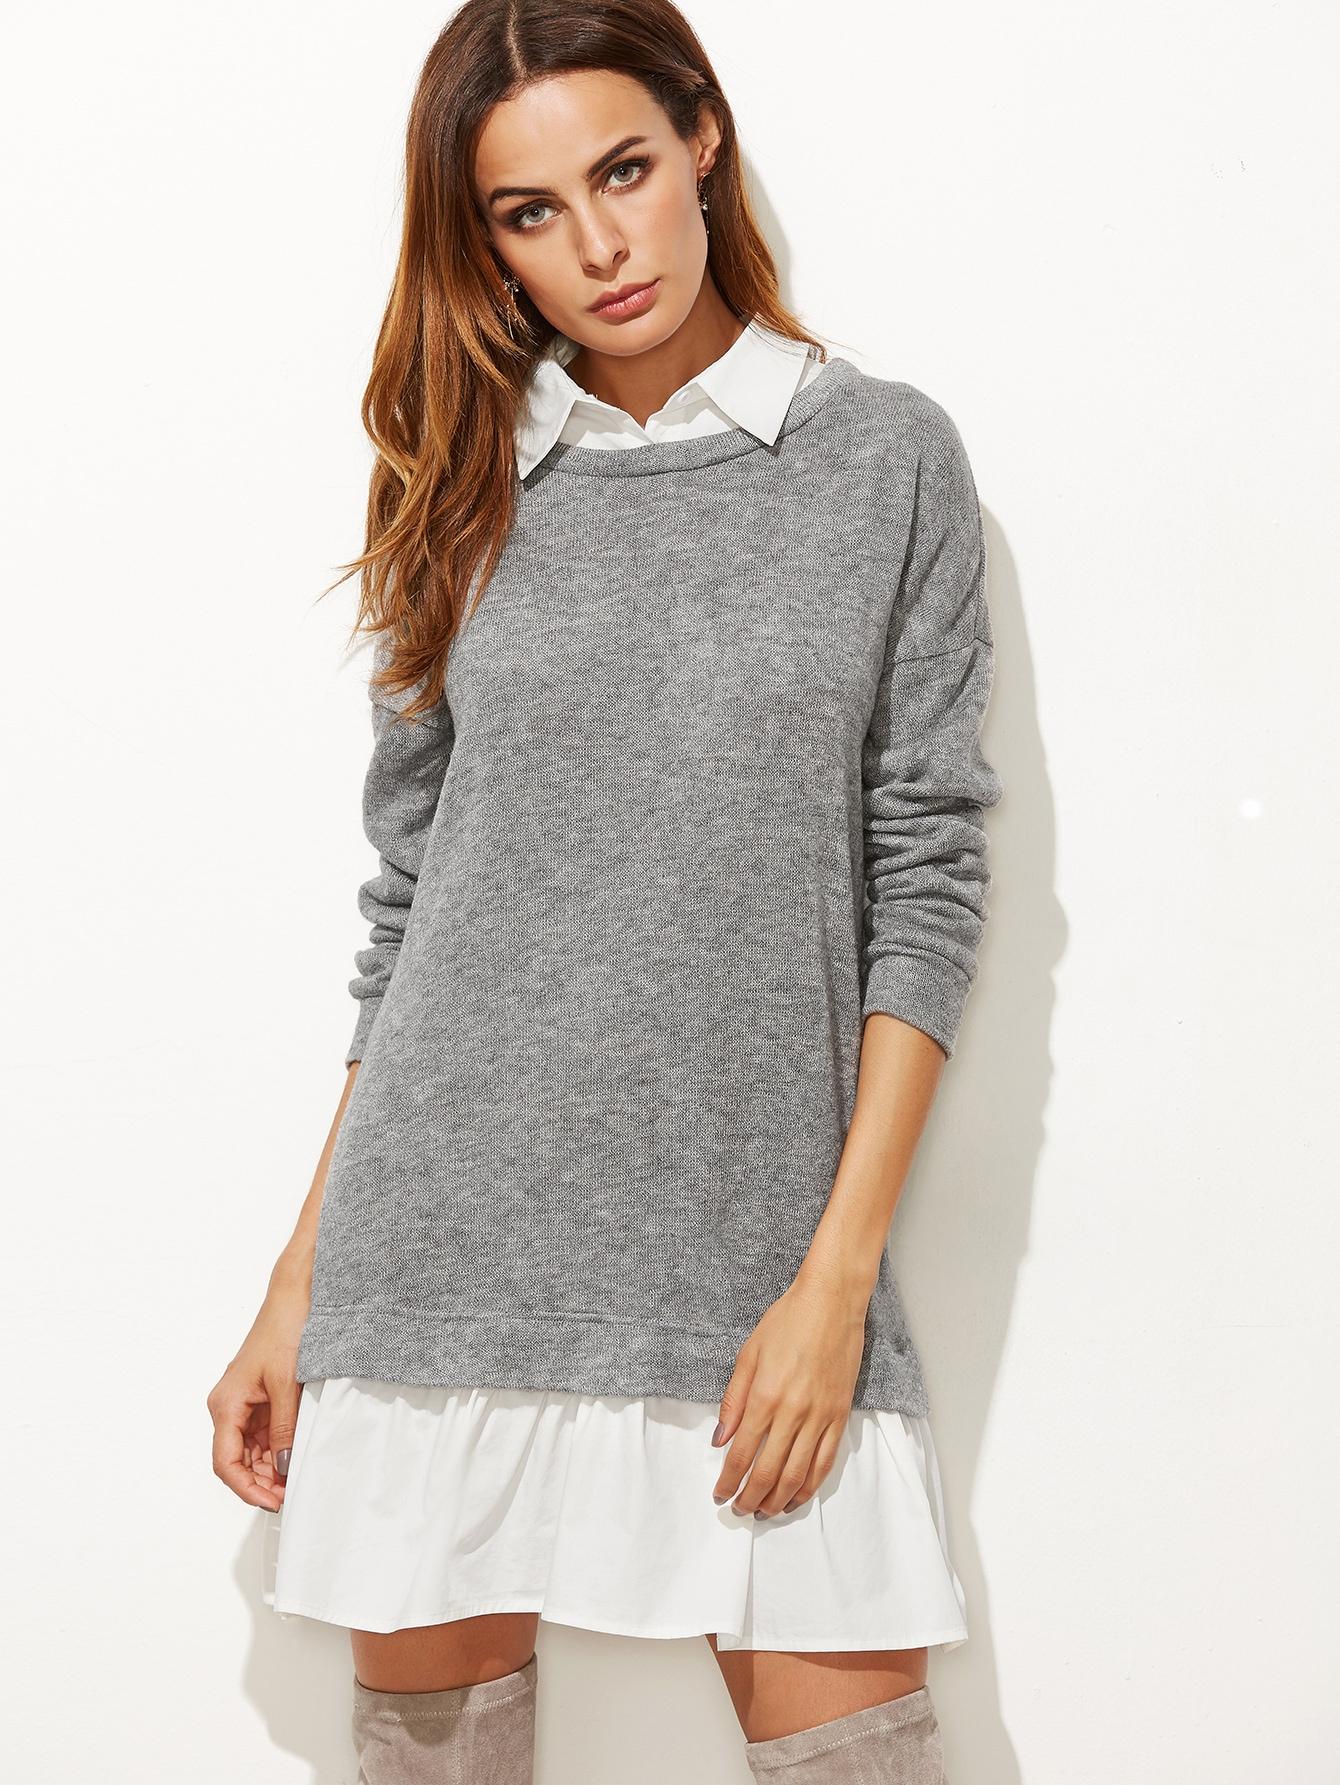 Heather Grey Contrast Collar And Hem 2 In 1 Sweatshirt Dress